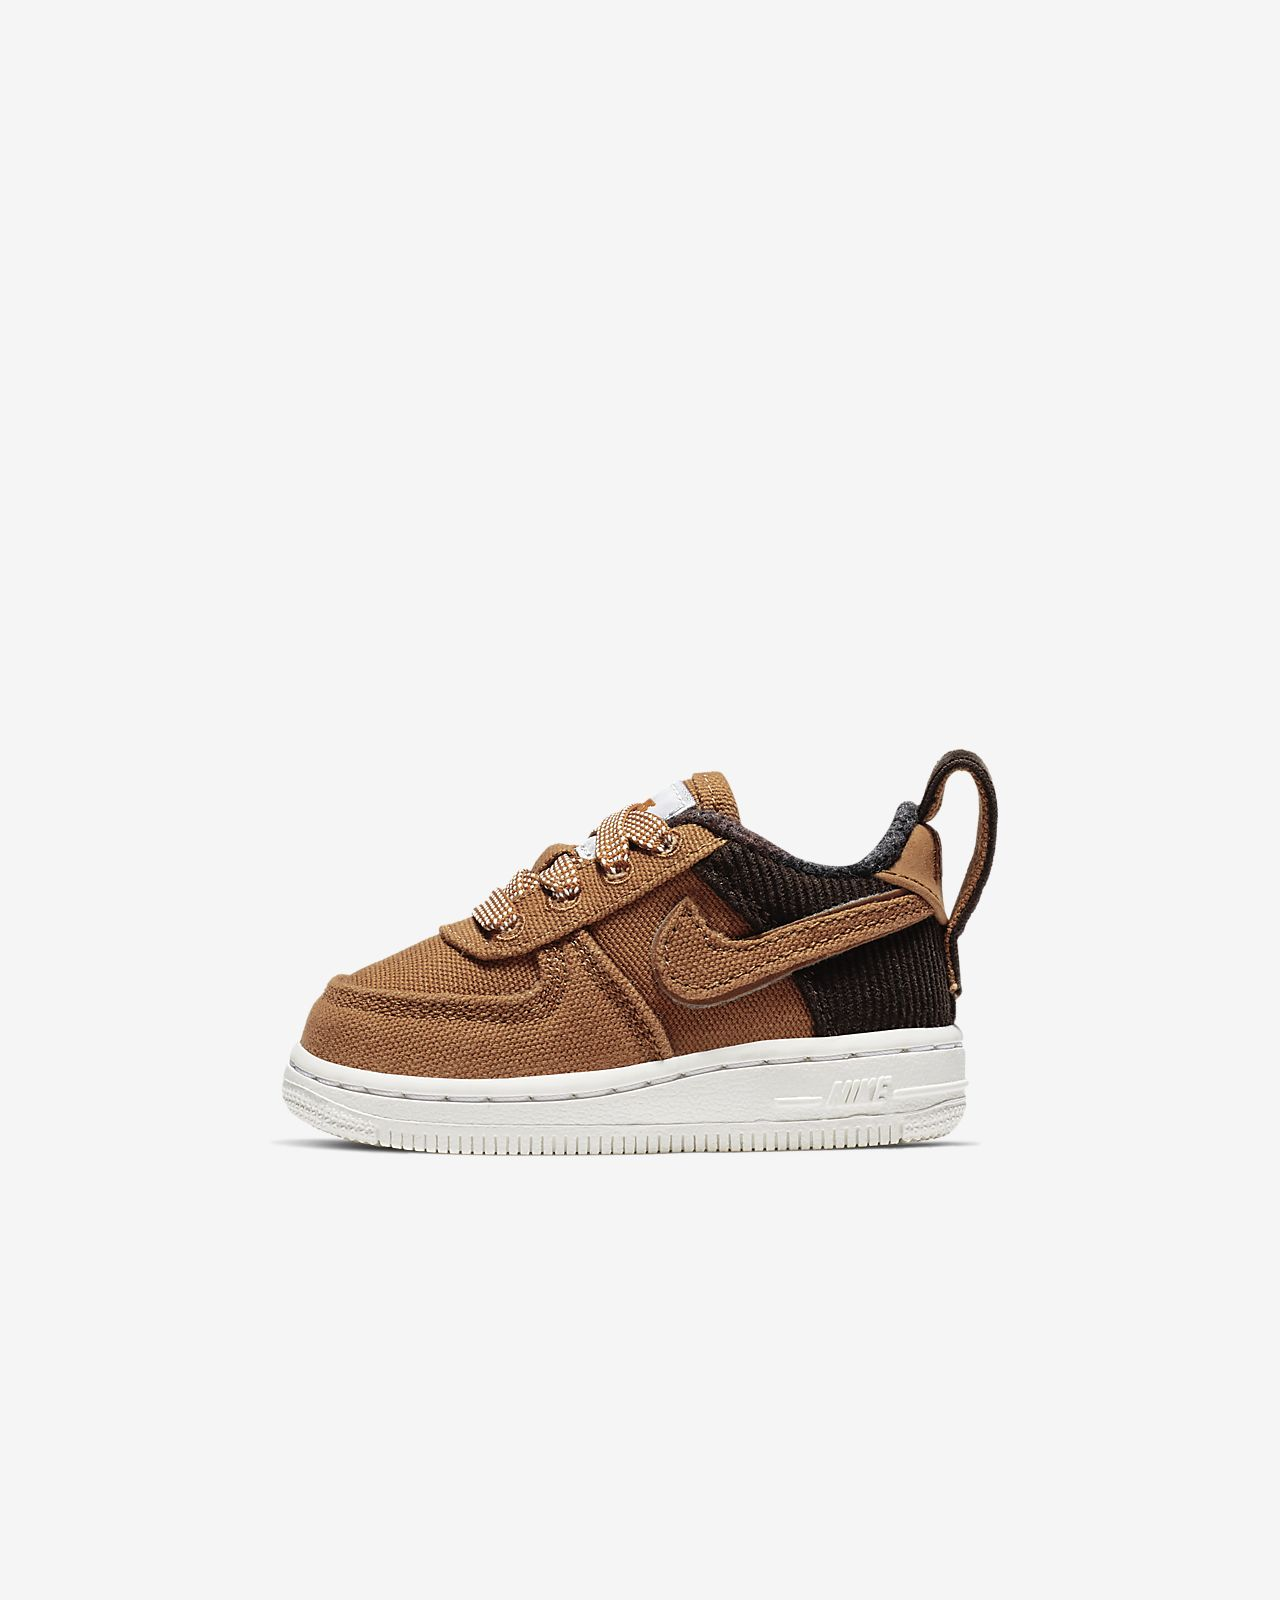 chaussure nike air force 1 premium wip